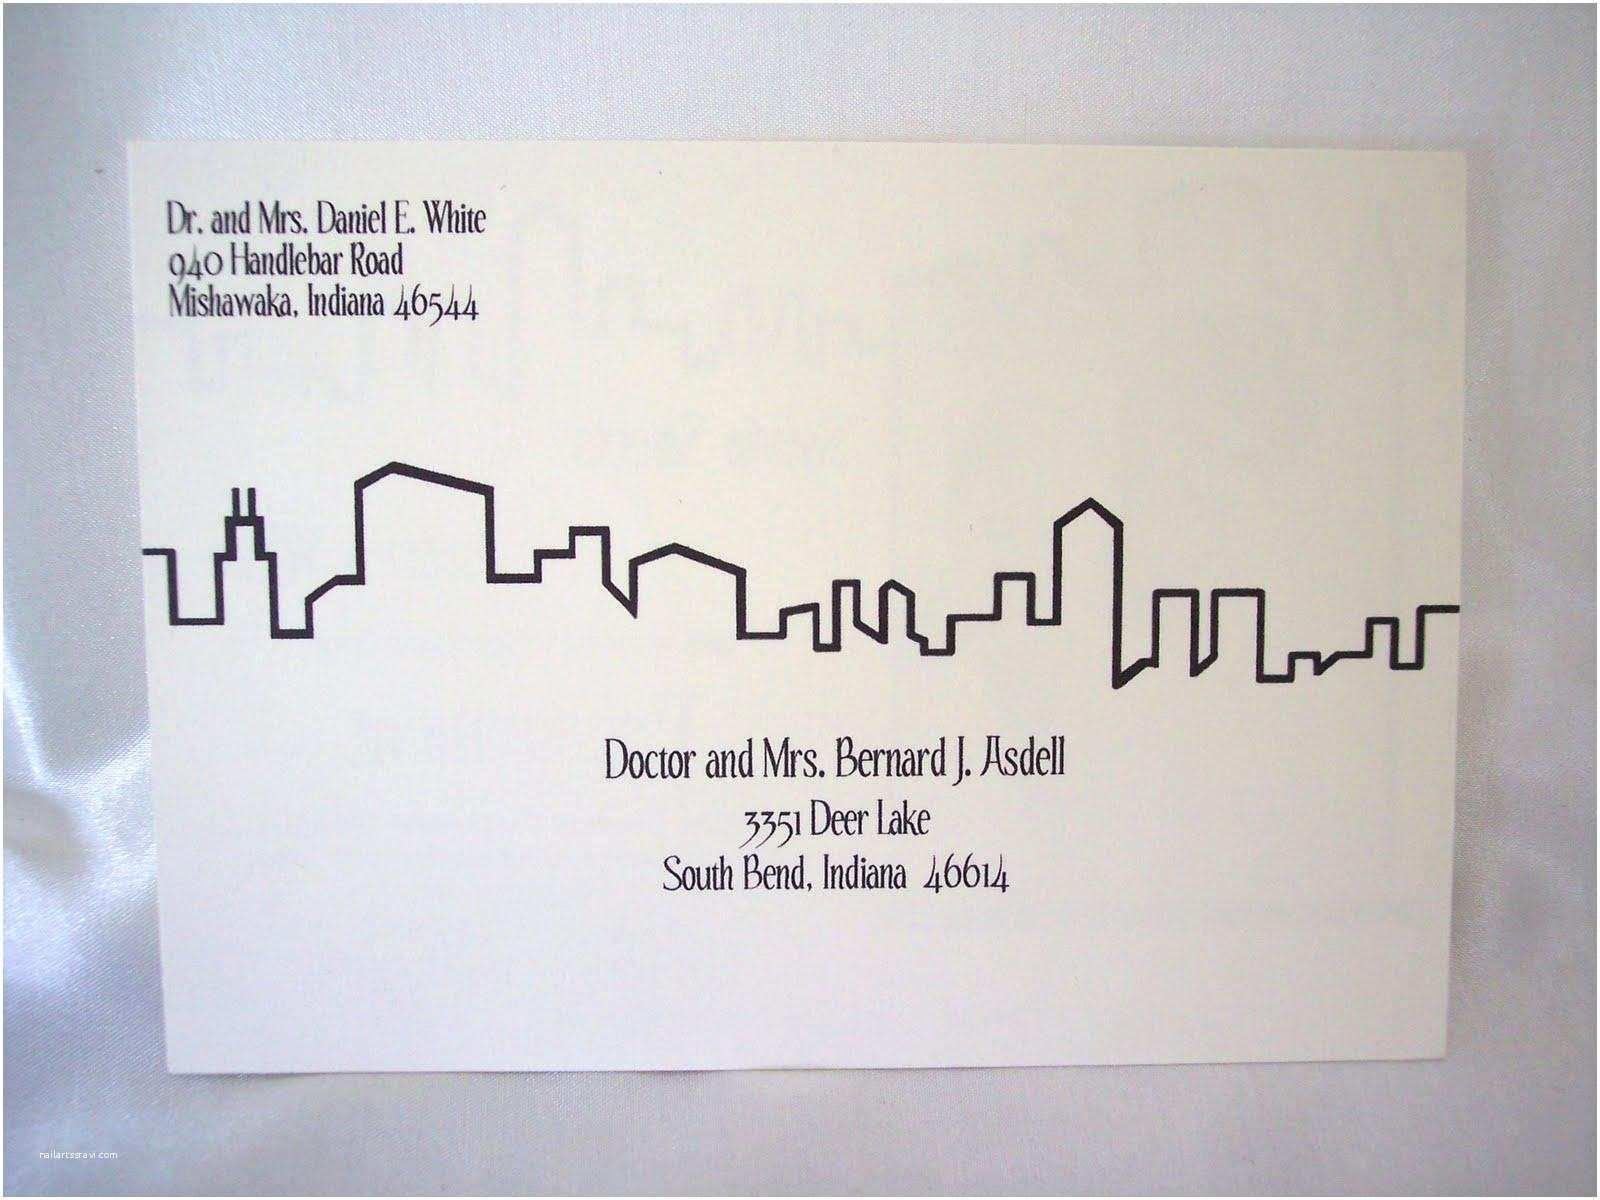 Wedding Invitations Etiquette Addressing Envelopes Bridal Shower Invitation Verbiage Bridal Shower